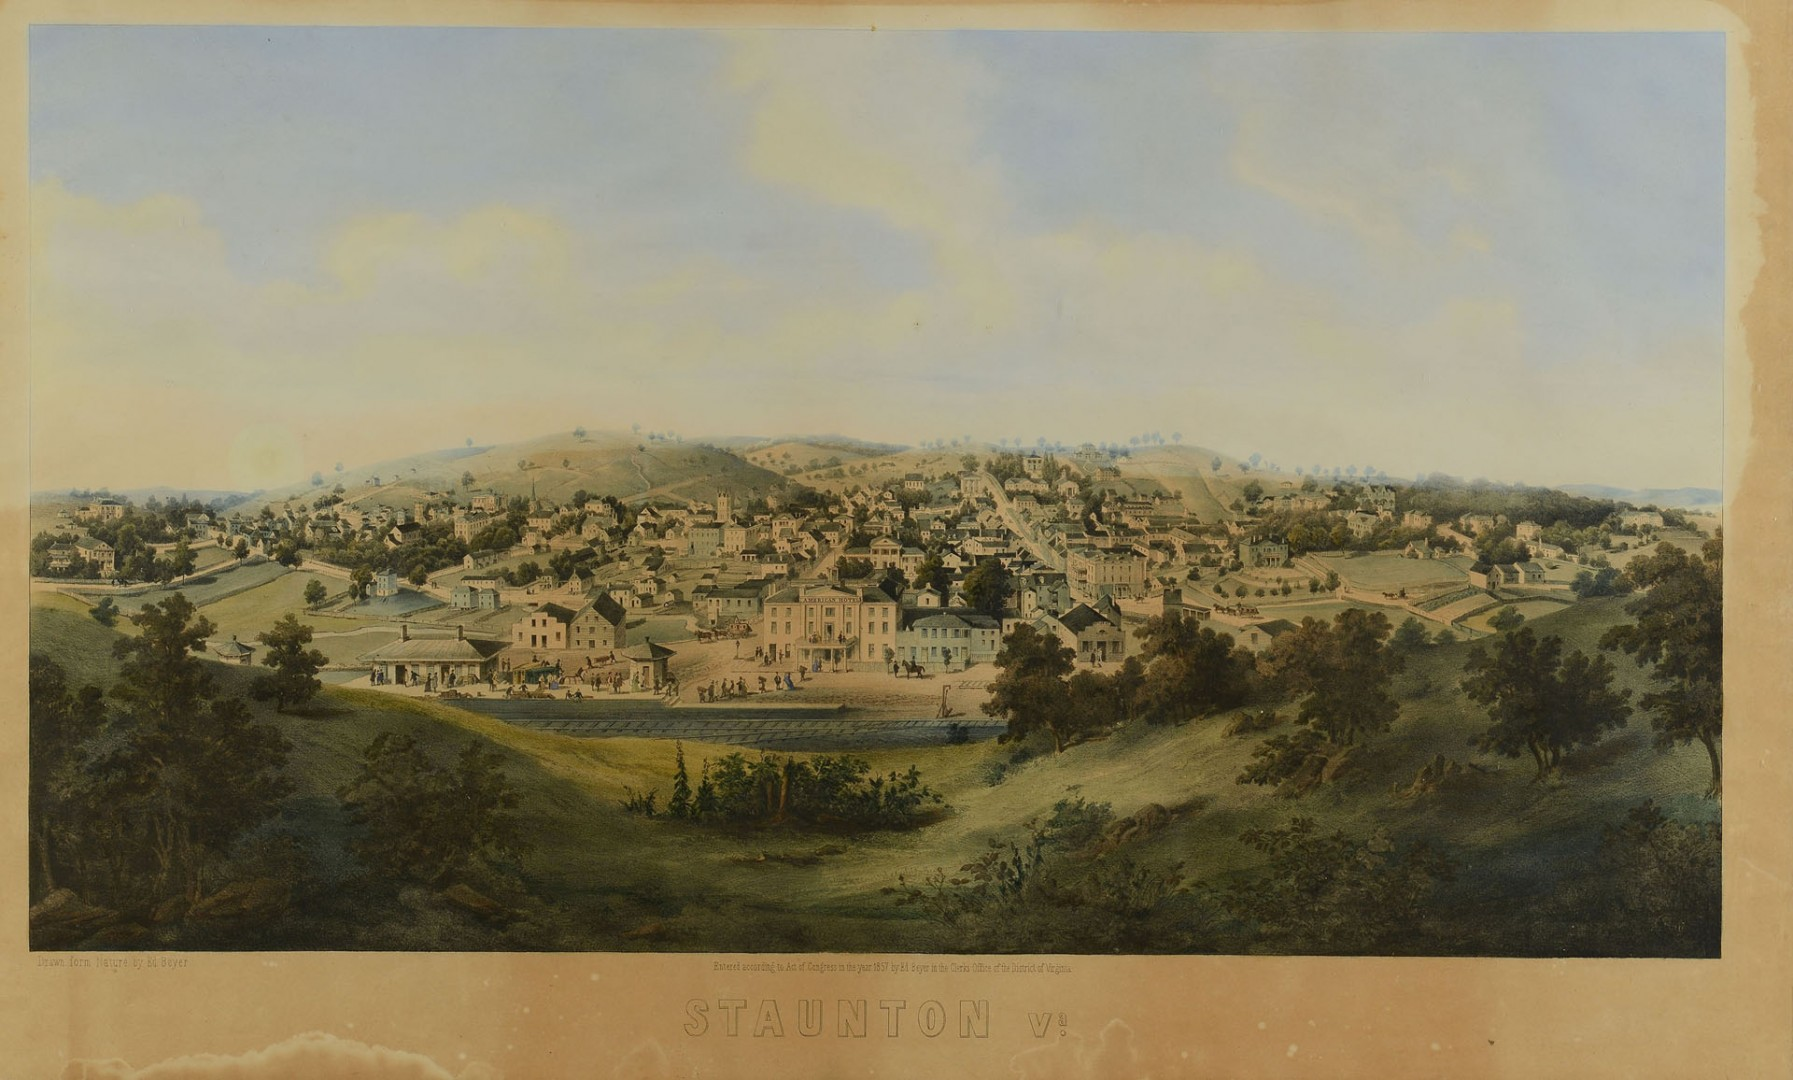 Ed Beyer Lithographic View of Staunton, VA